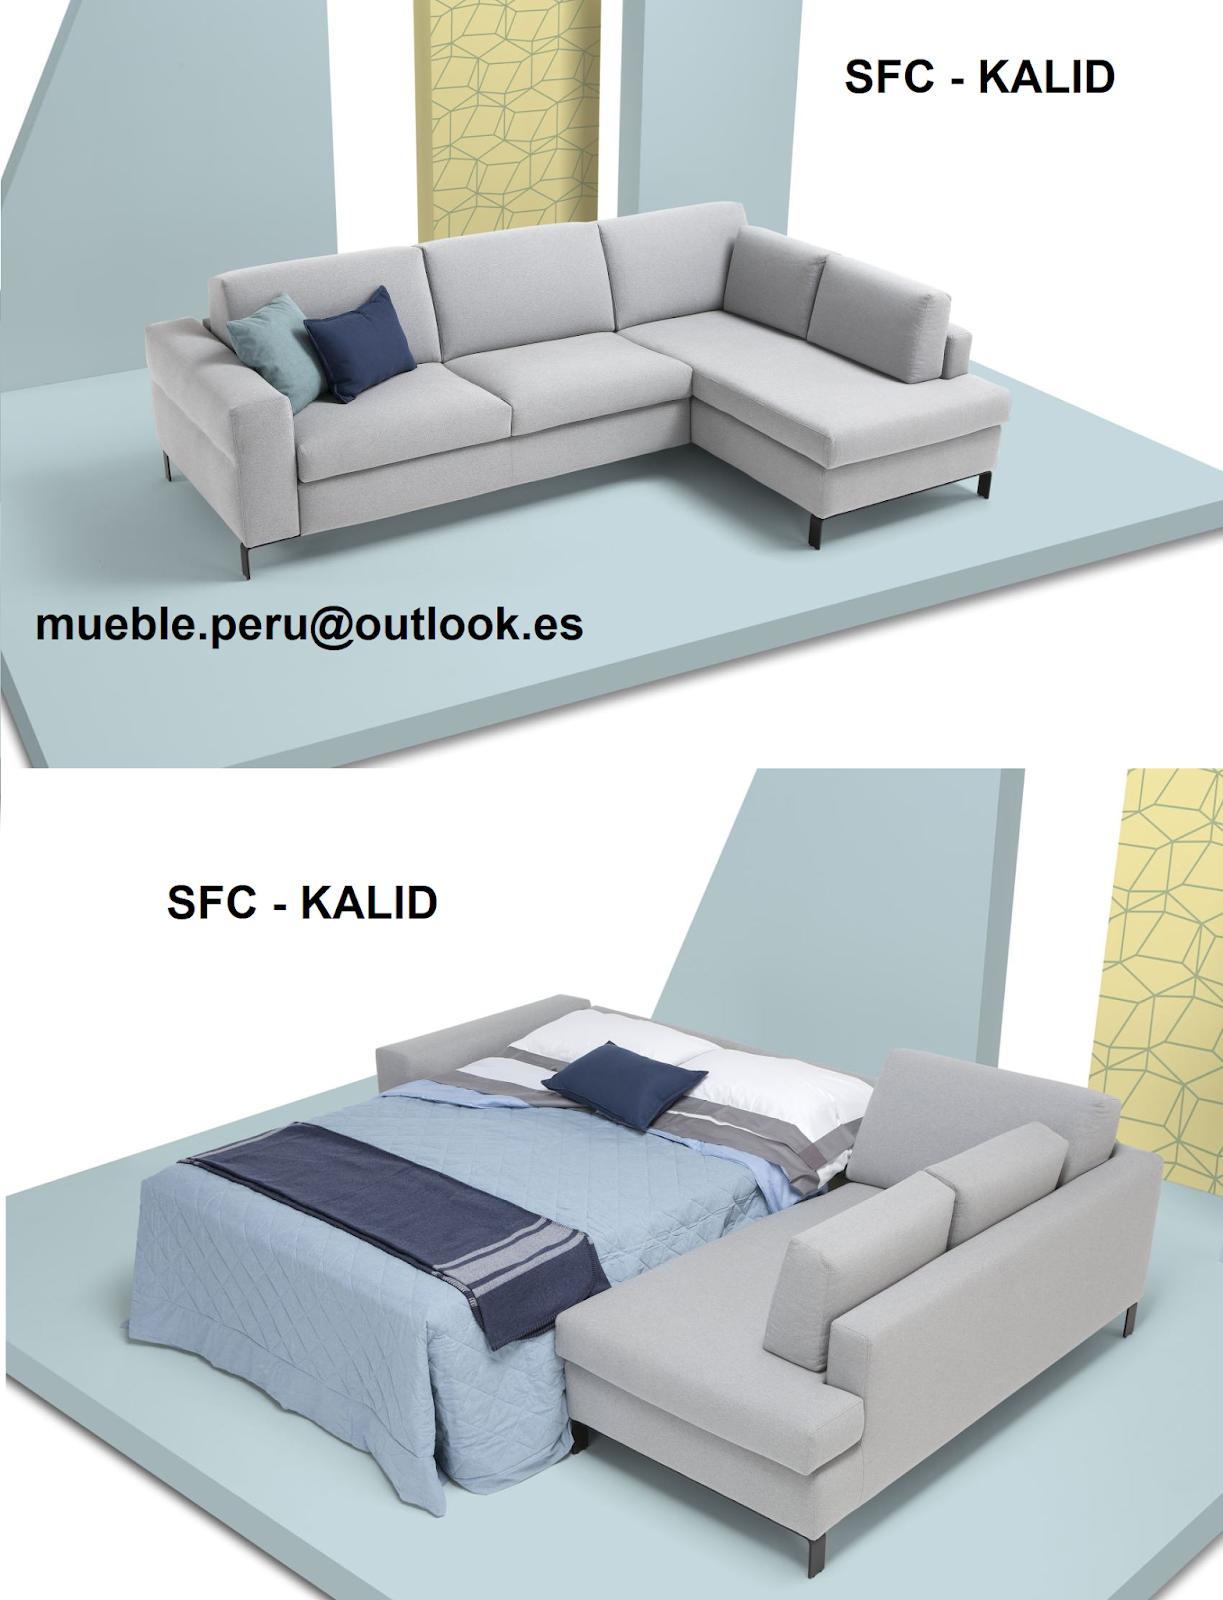 sofa sfc 8 ft bean bag mueble peru sakuray cama seccional kalid